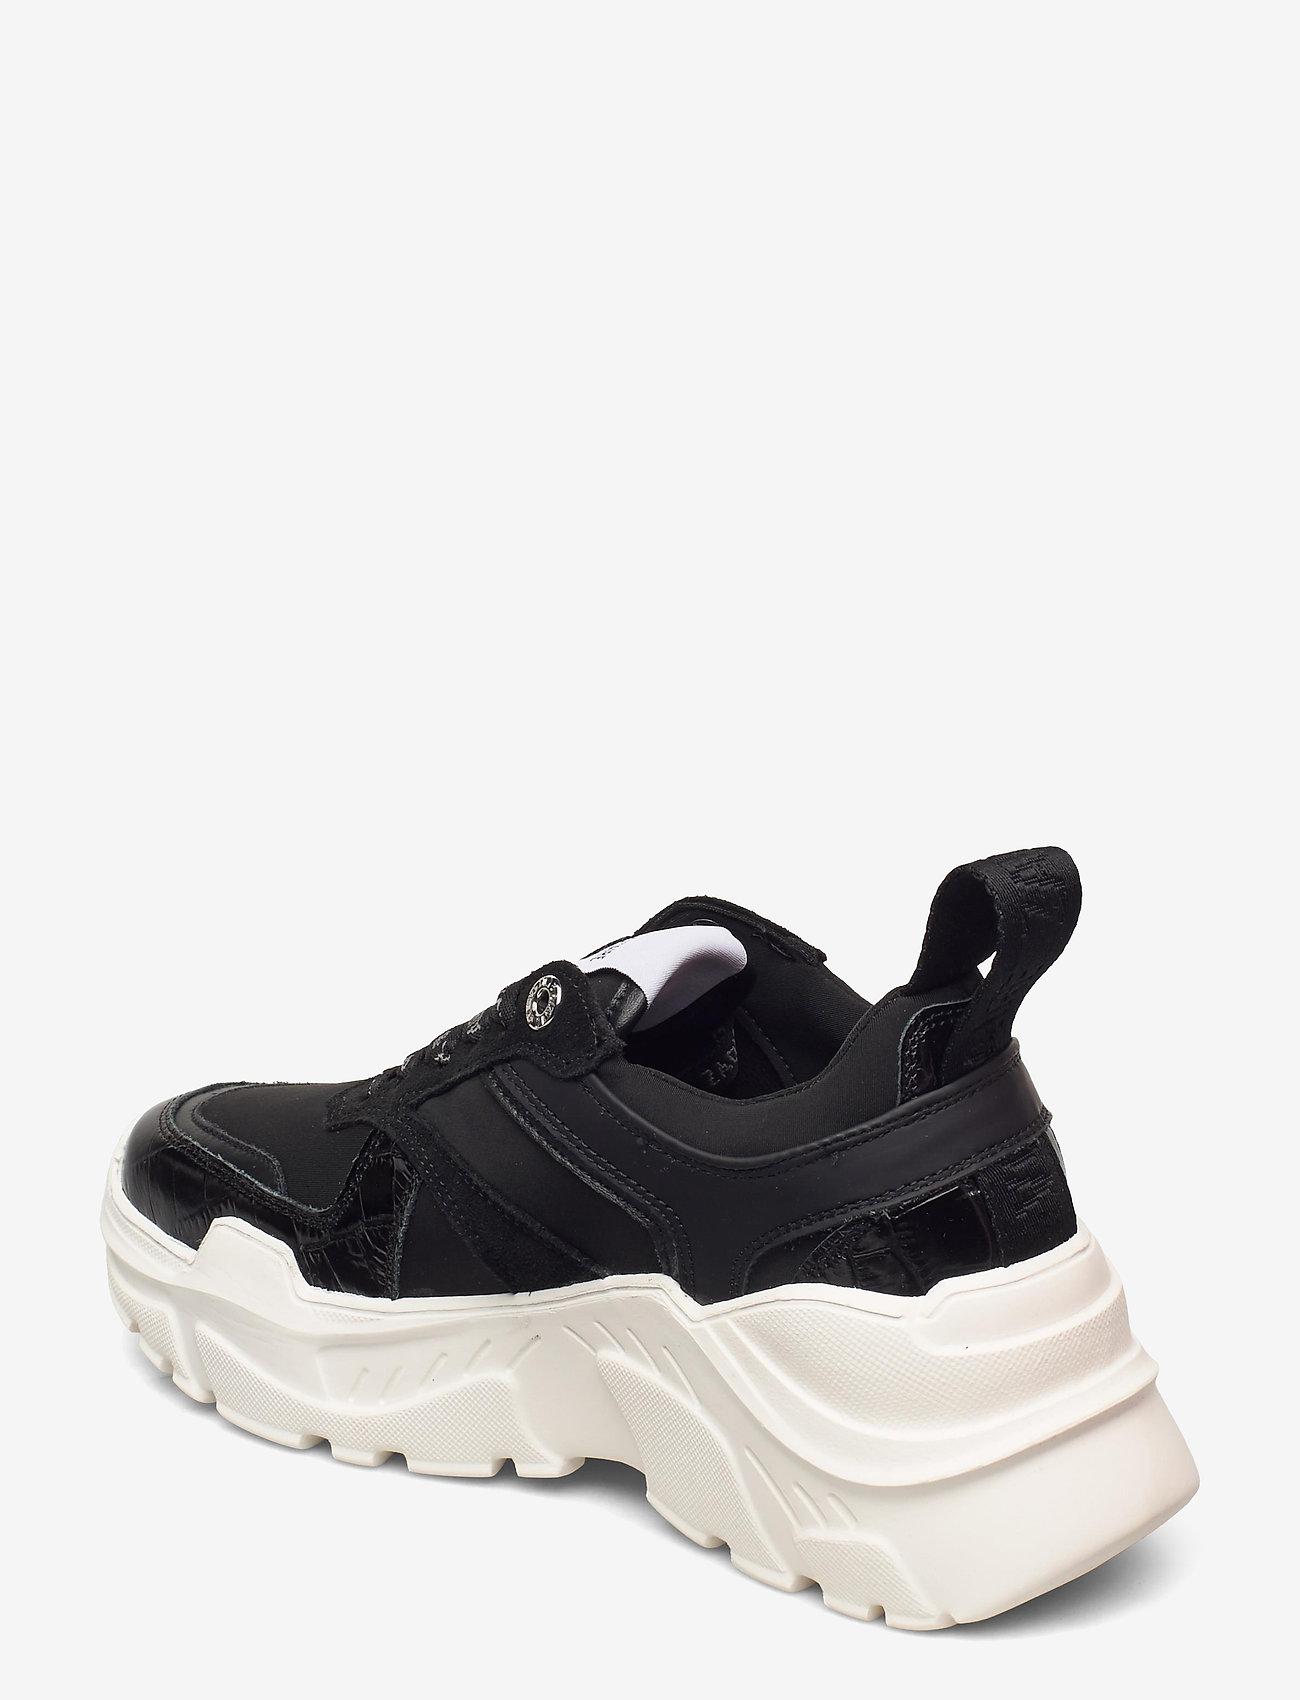 Zadig & Voltaire - FUTURE EMBOSSED CROCO + MIX NEOPRENE - chunky sneakers - black - 2